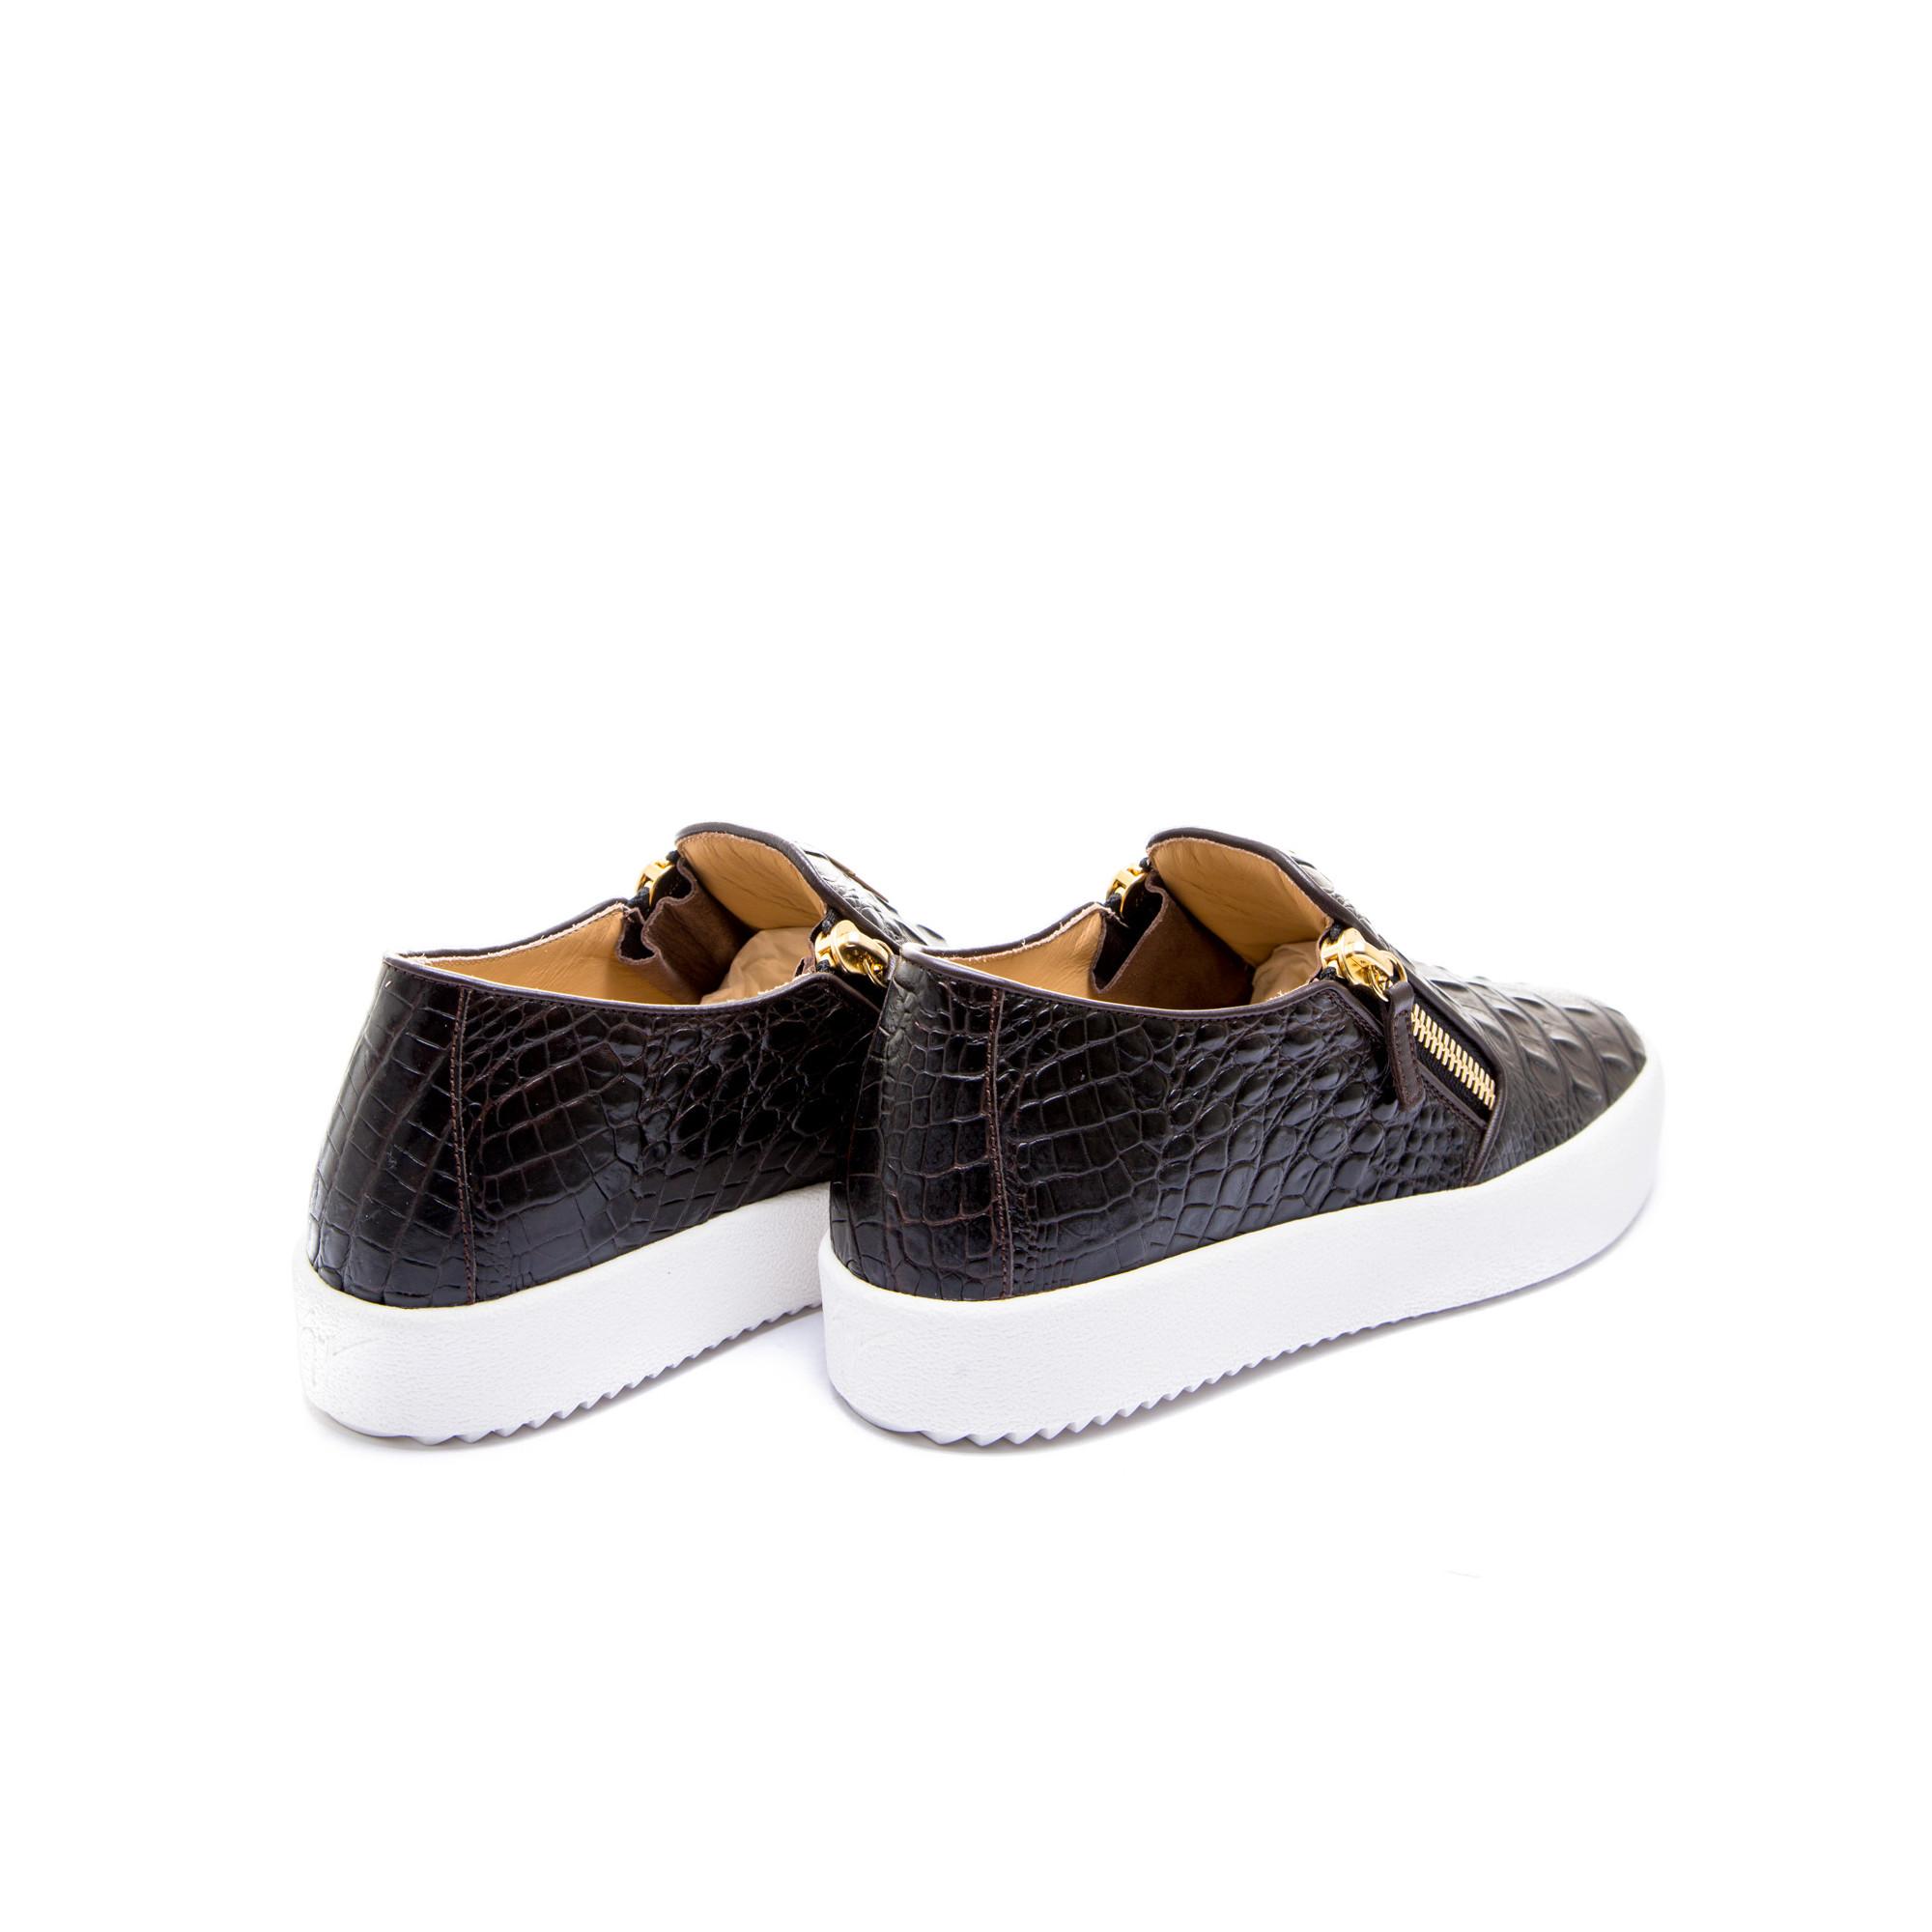 Brun Giuseppe Zanotti Chaussures Pour Femmes xvzQDJvWjC